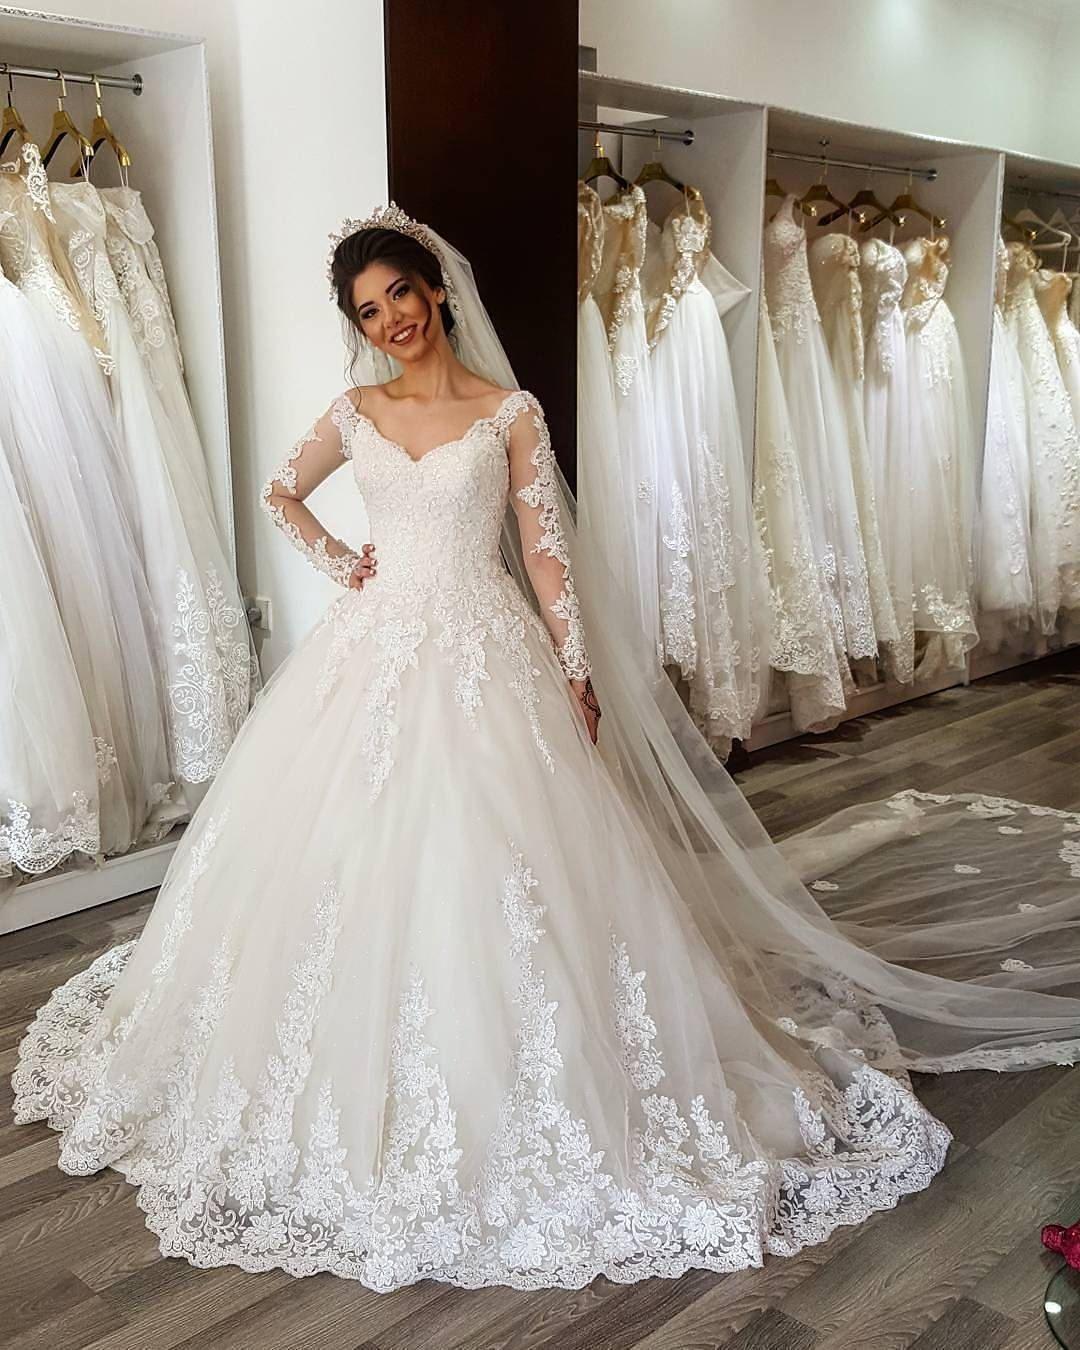 Charming Wedding DressBall Gown Wedding DressesFull Sleeve Wedding